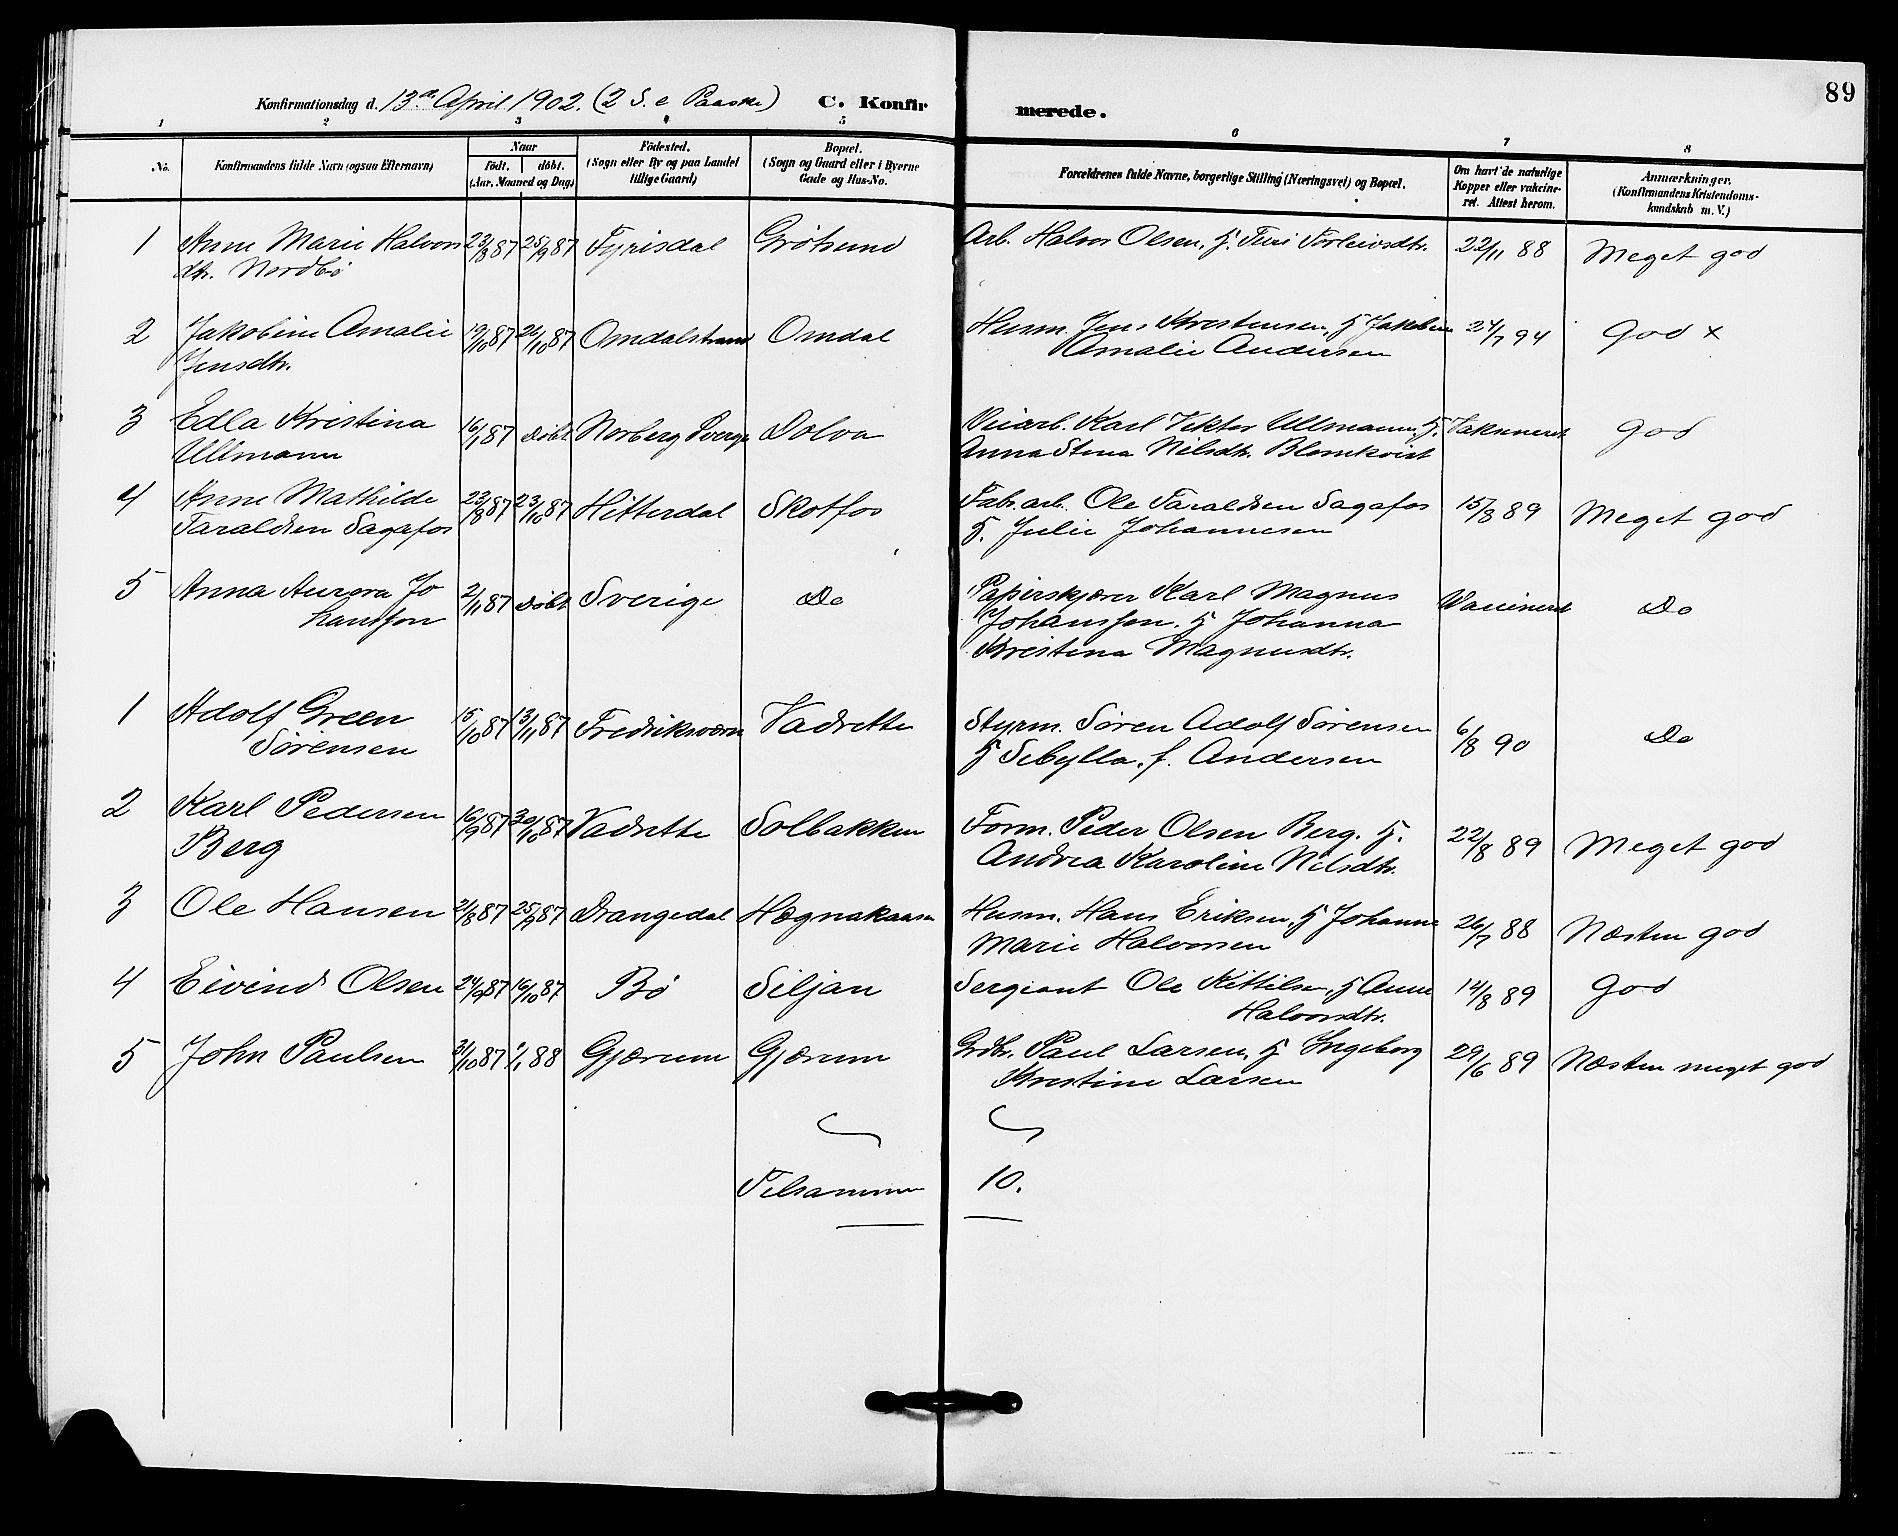 SAKO, Solum kirkebøker, G/Gb/L0004: Klokkerbok nr. II 4, 1898-1905, s. 89